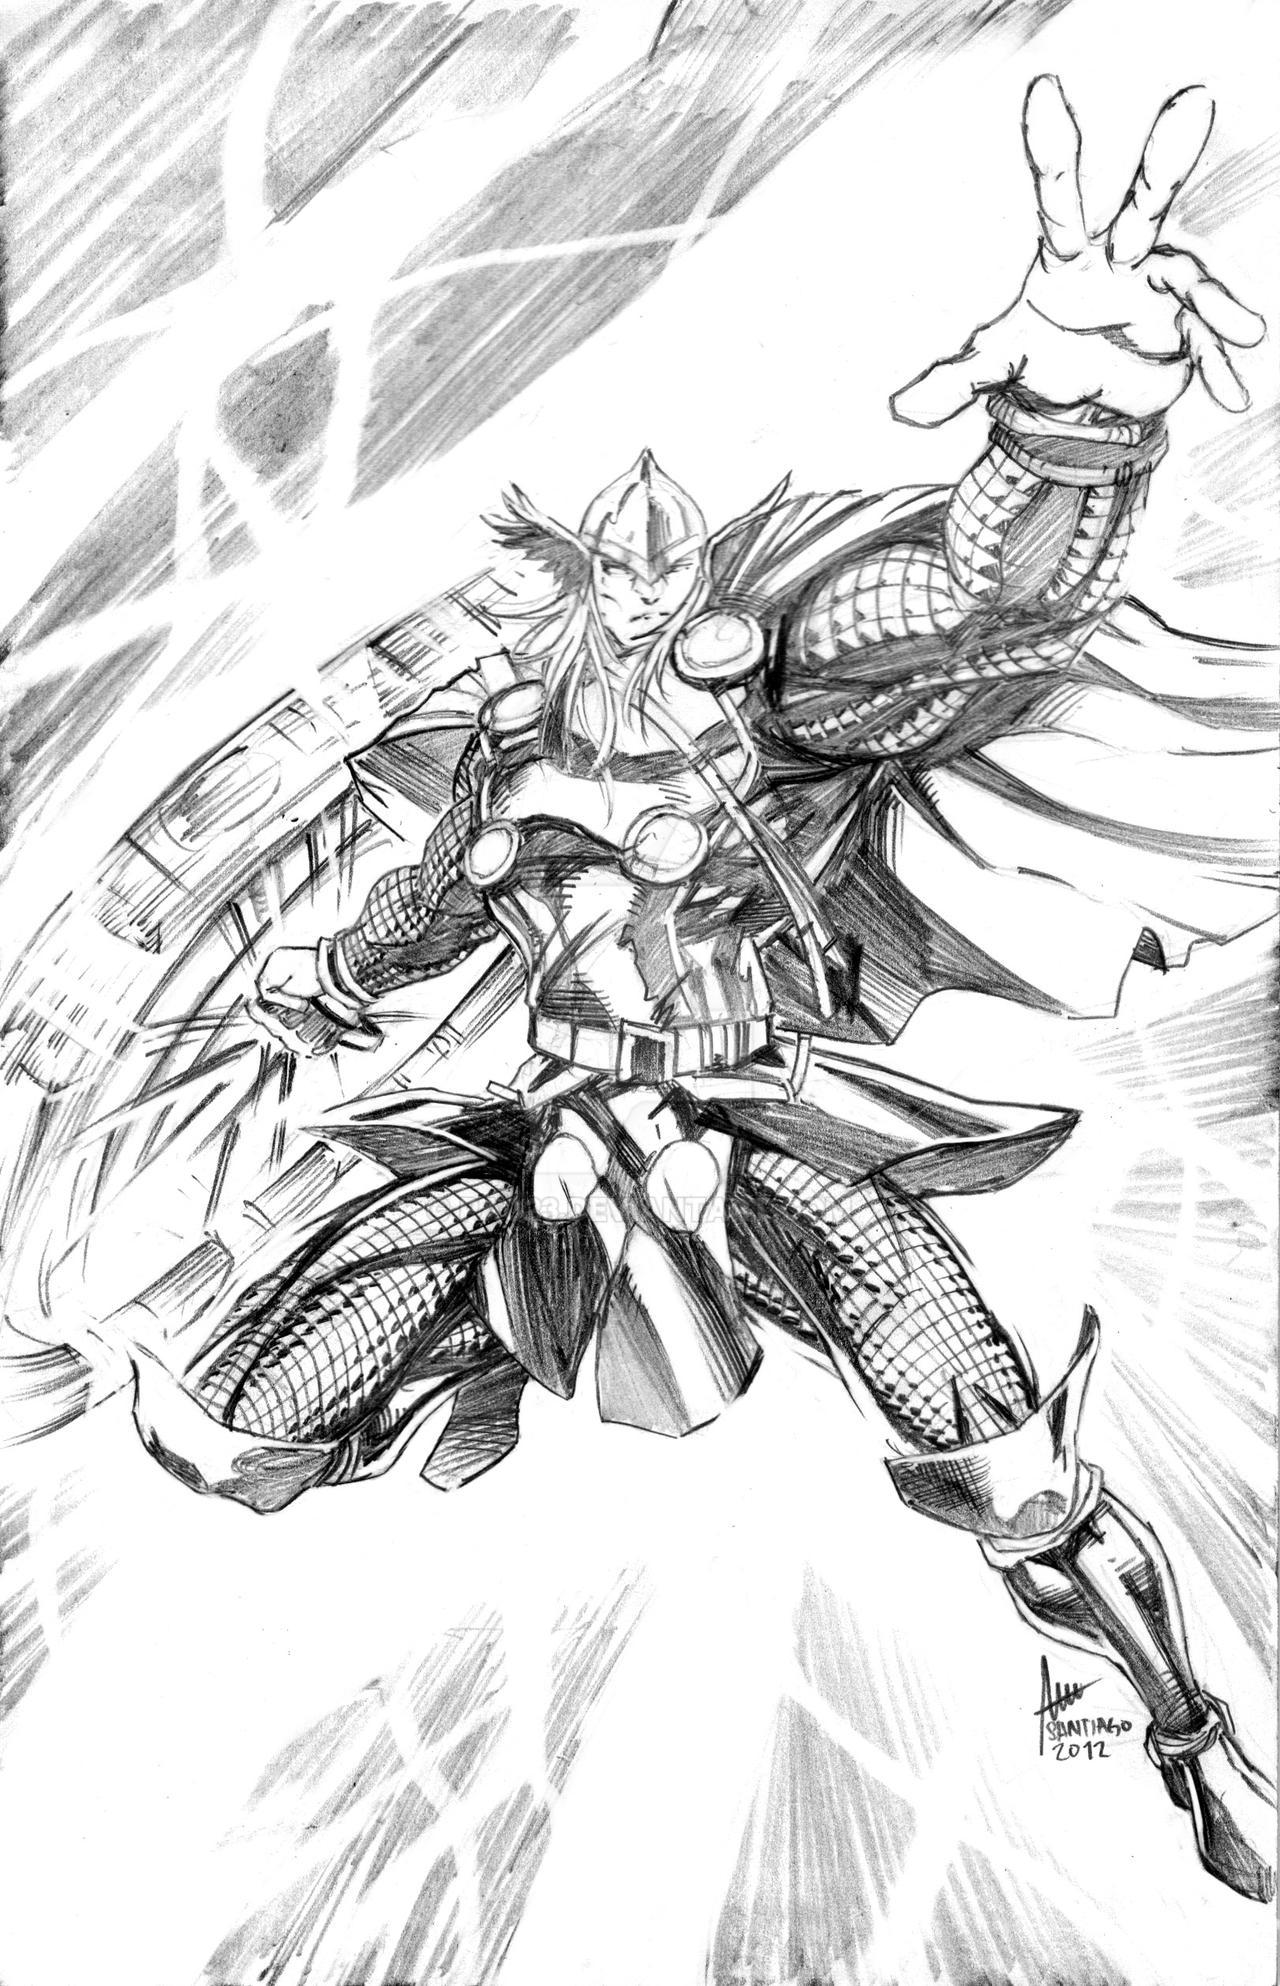 Venom Vs Wolverine Tattoo Thor Pencils Sketch By Pac D Ledn